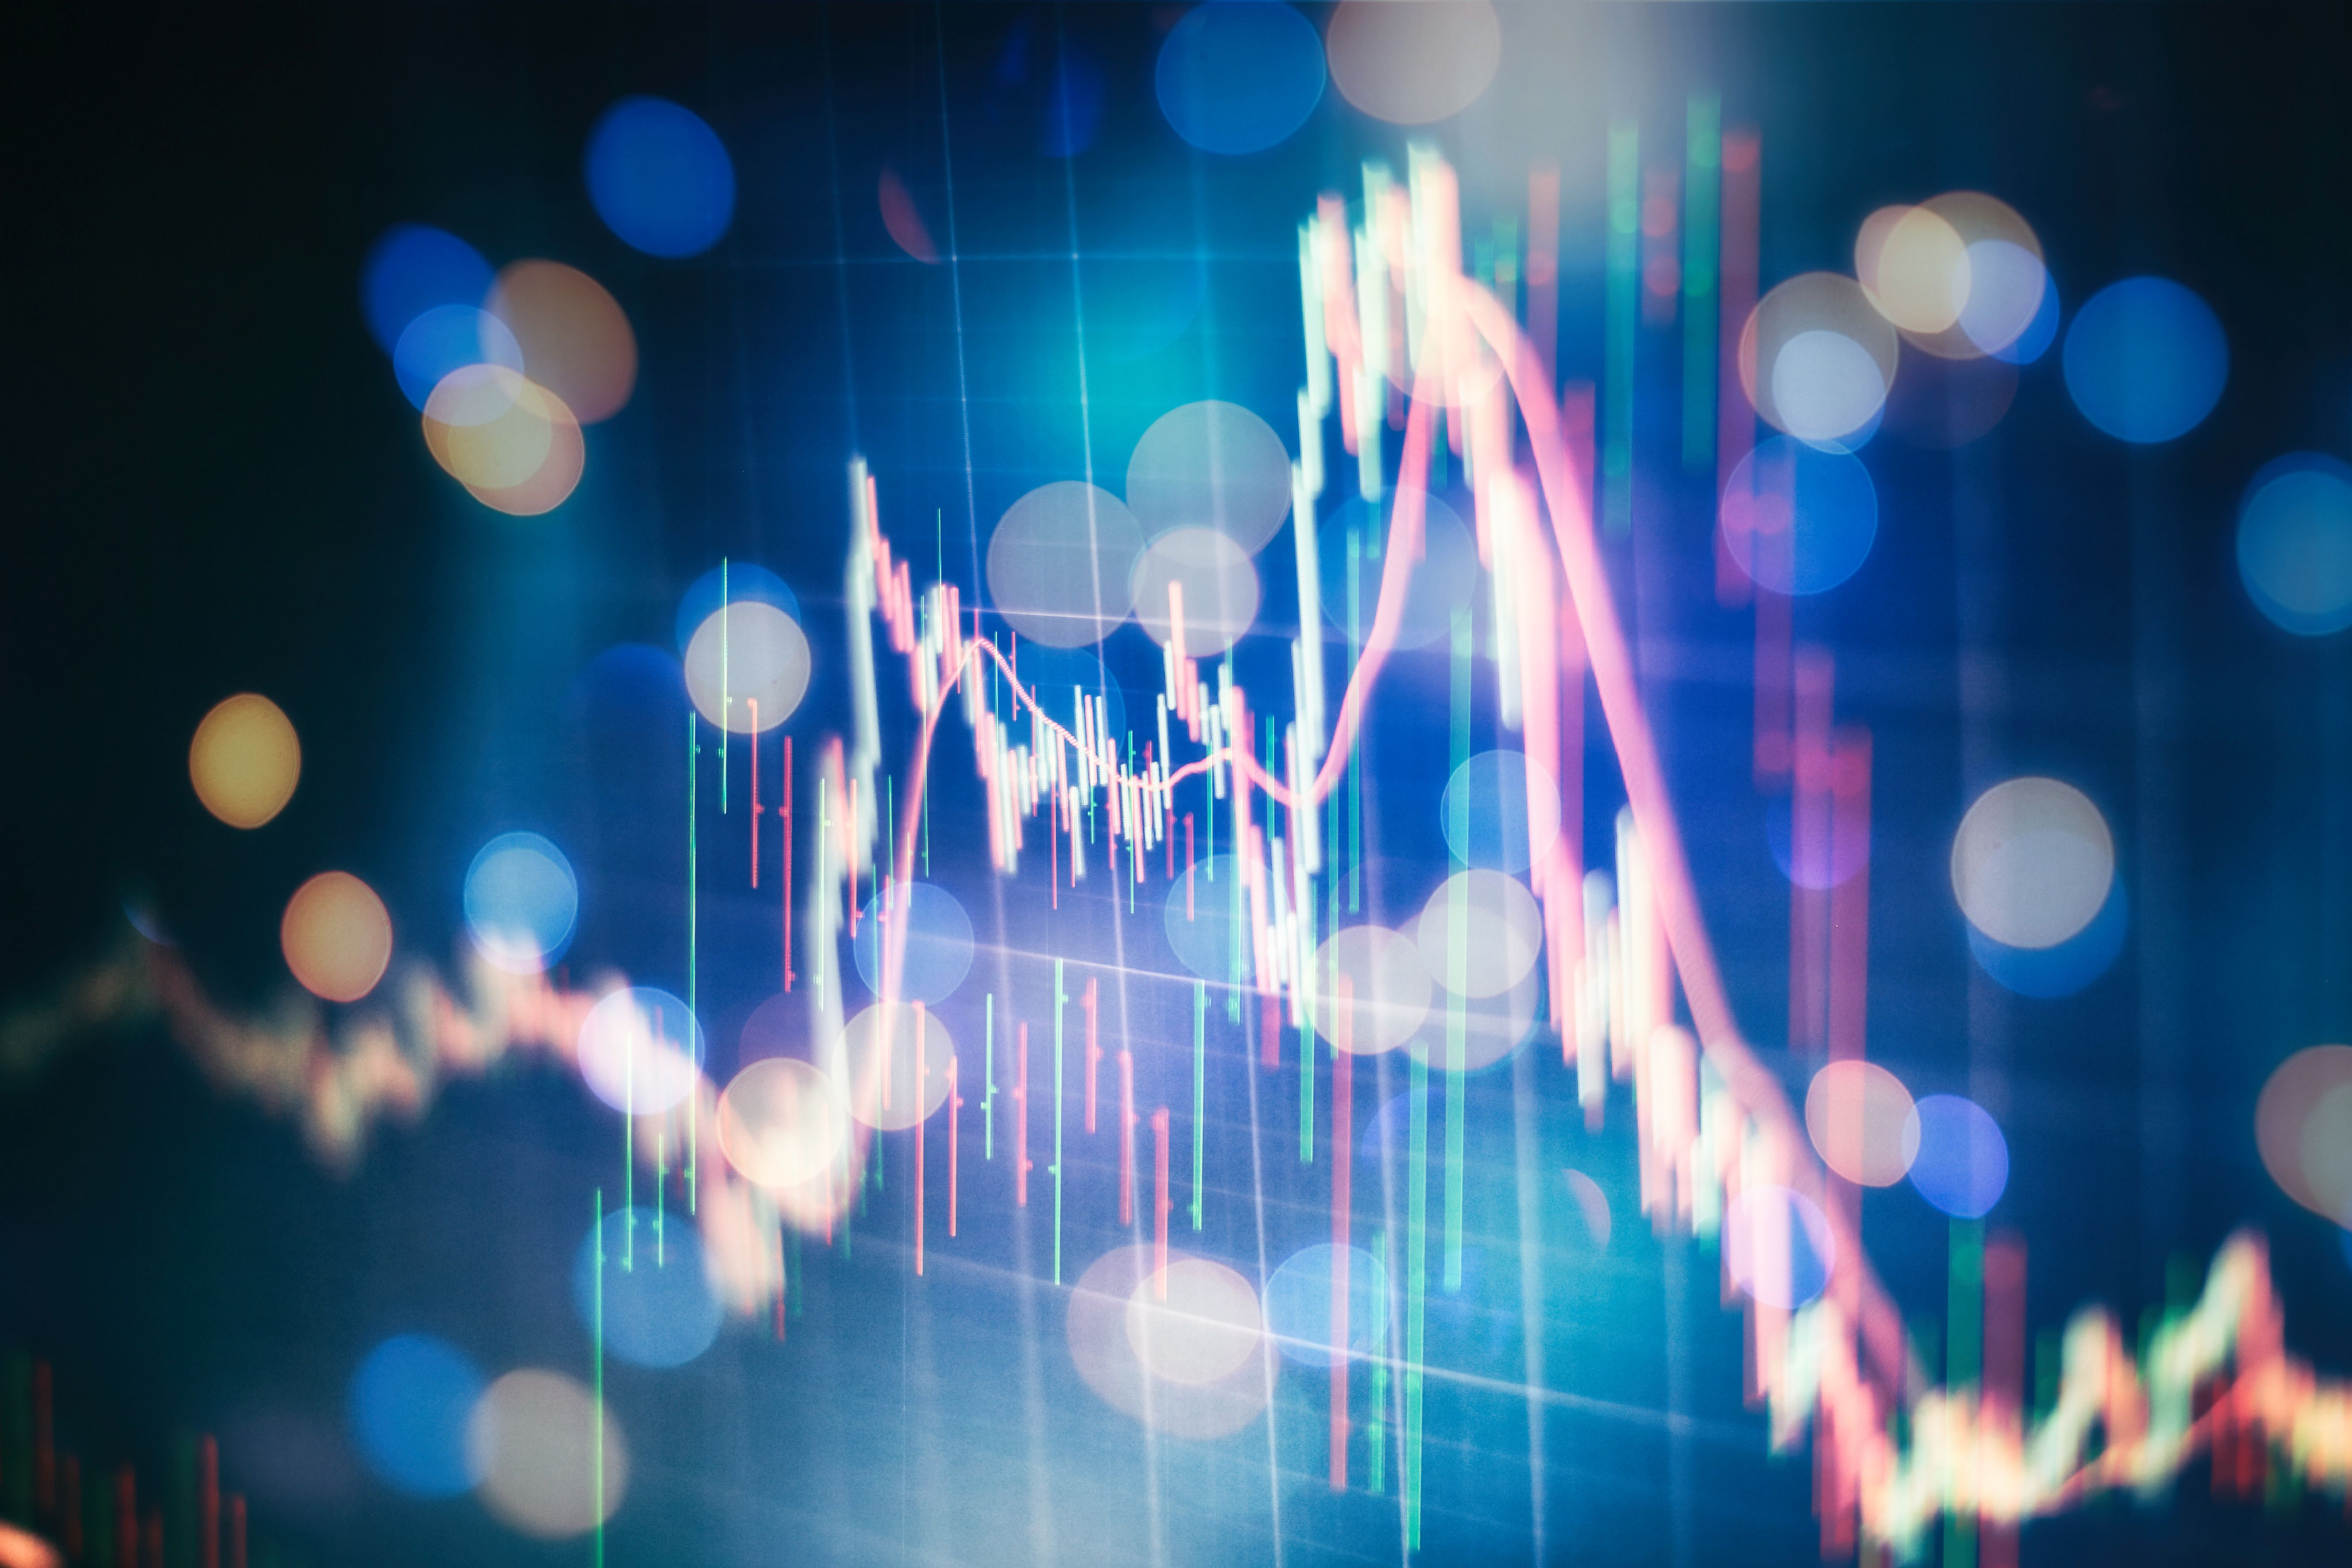 Top Performing Financials ETFs of 2018